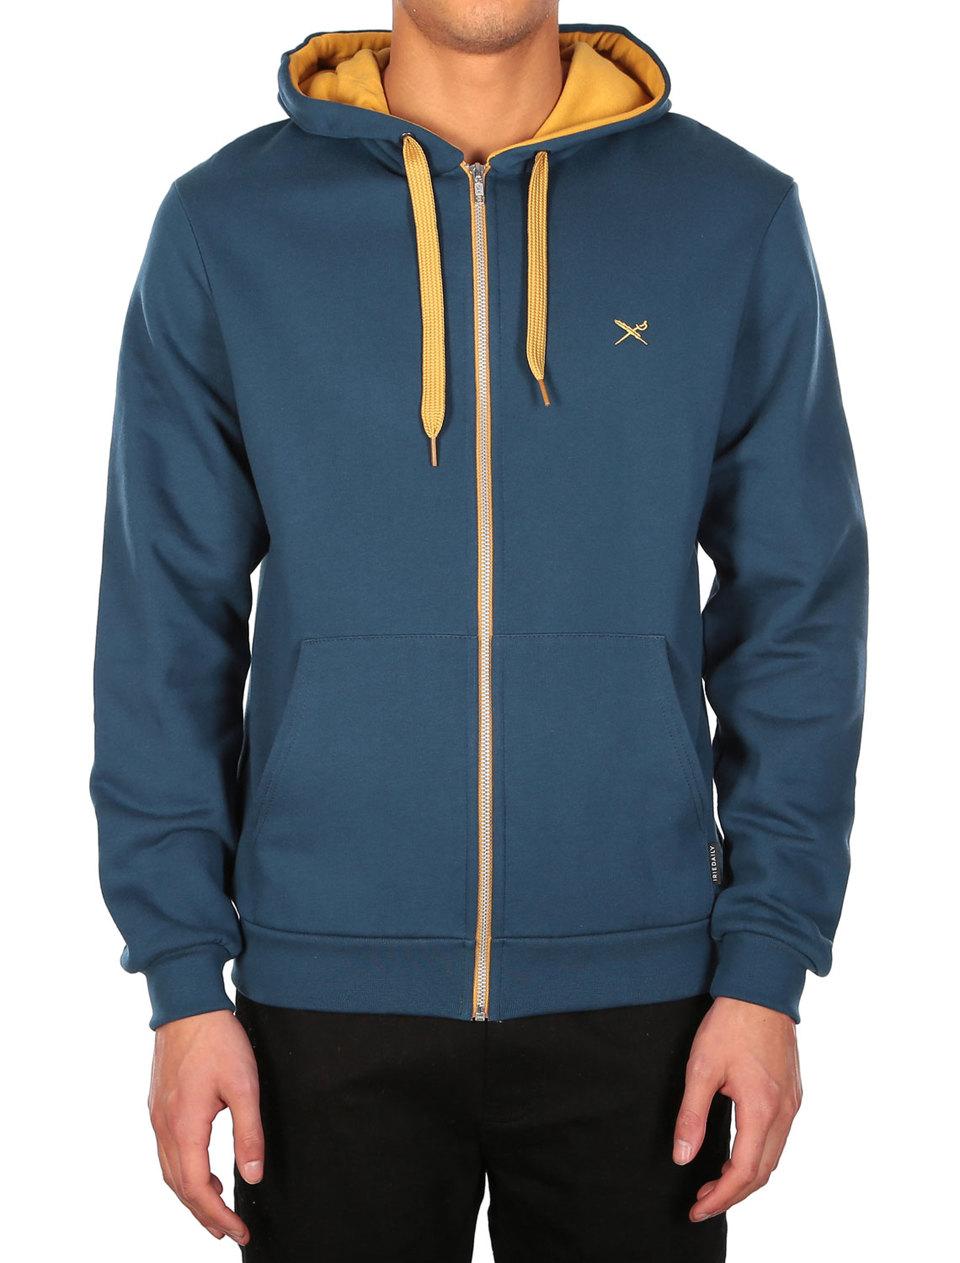 Mini Flag Zip Hood [orion blue]